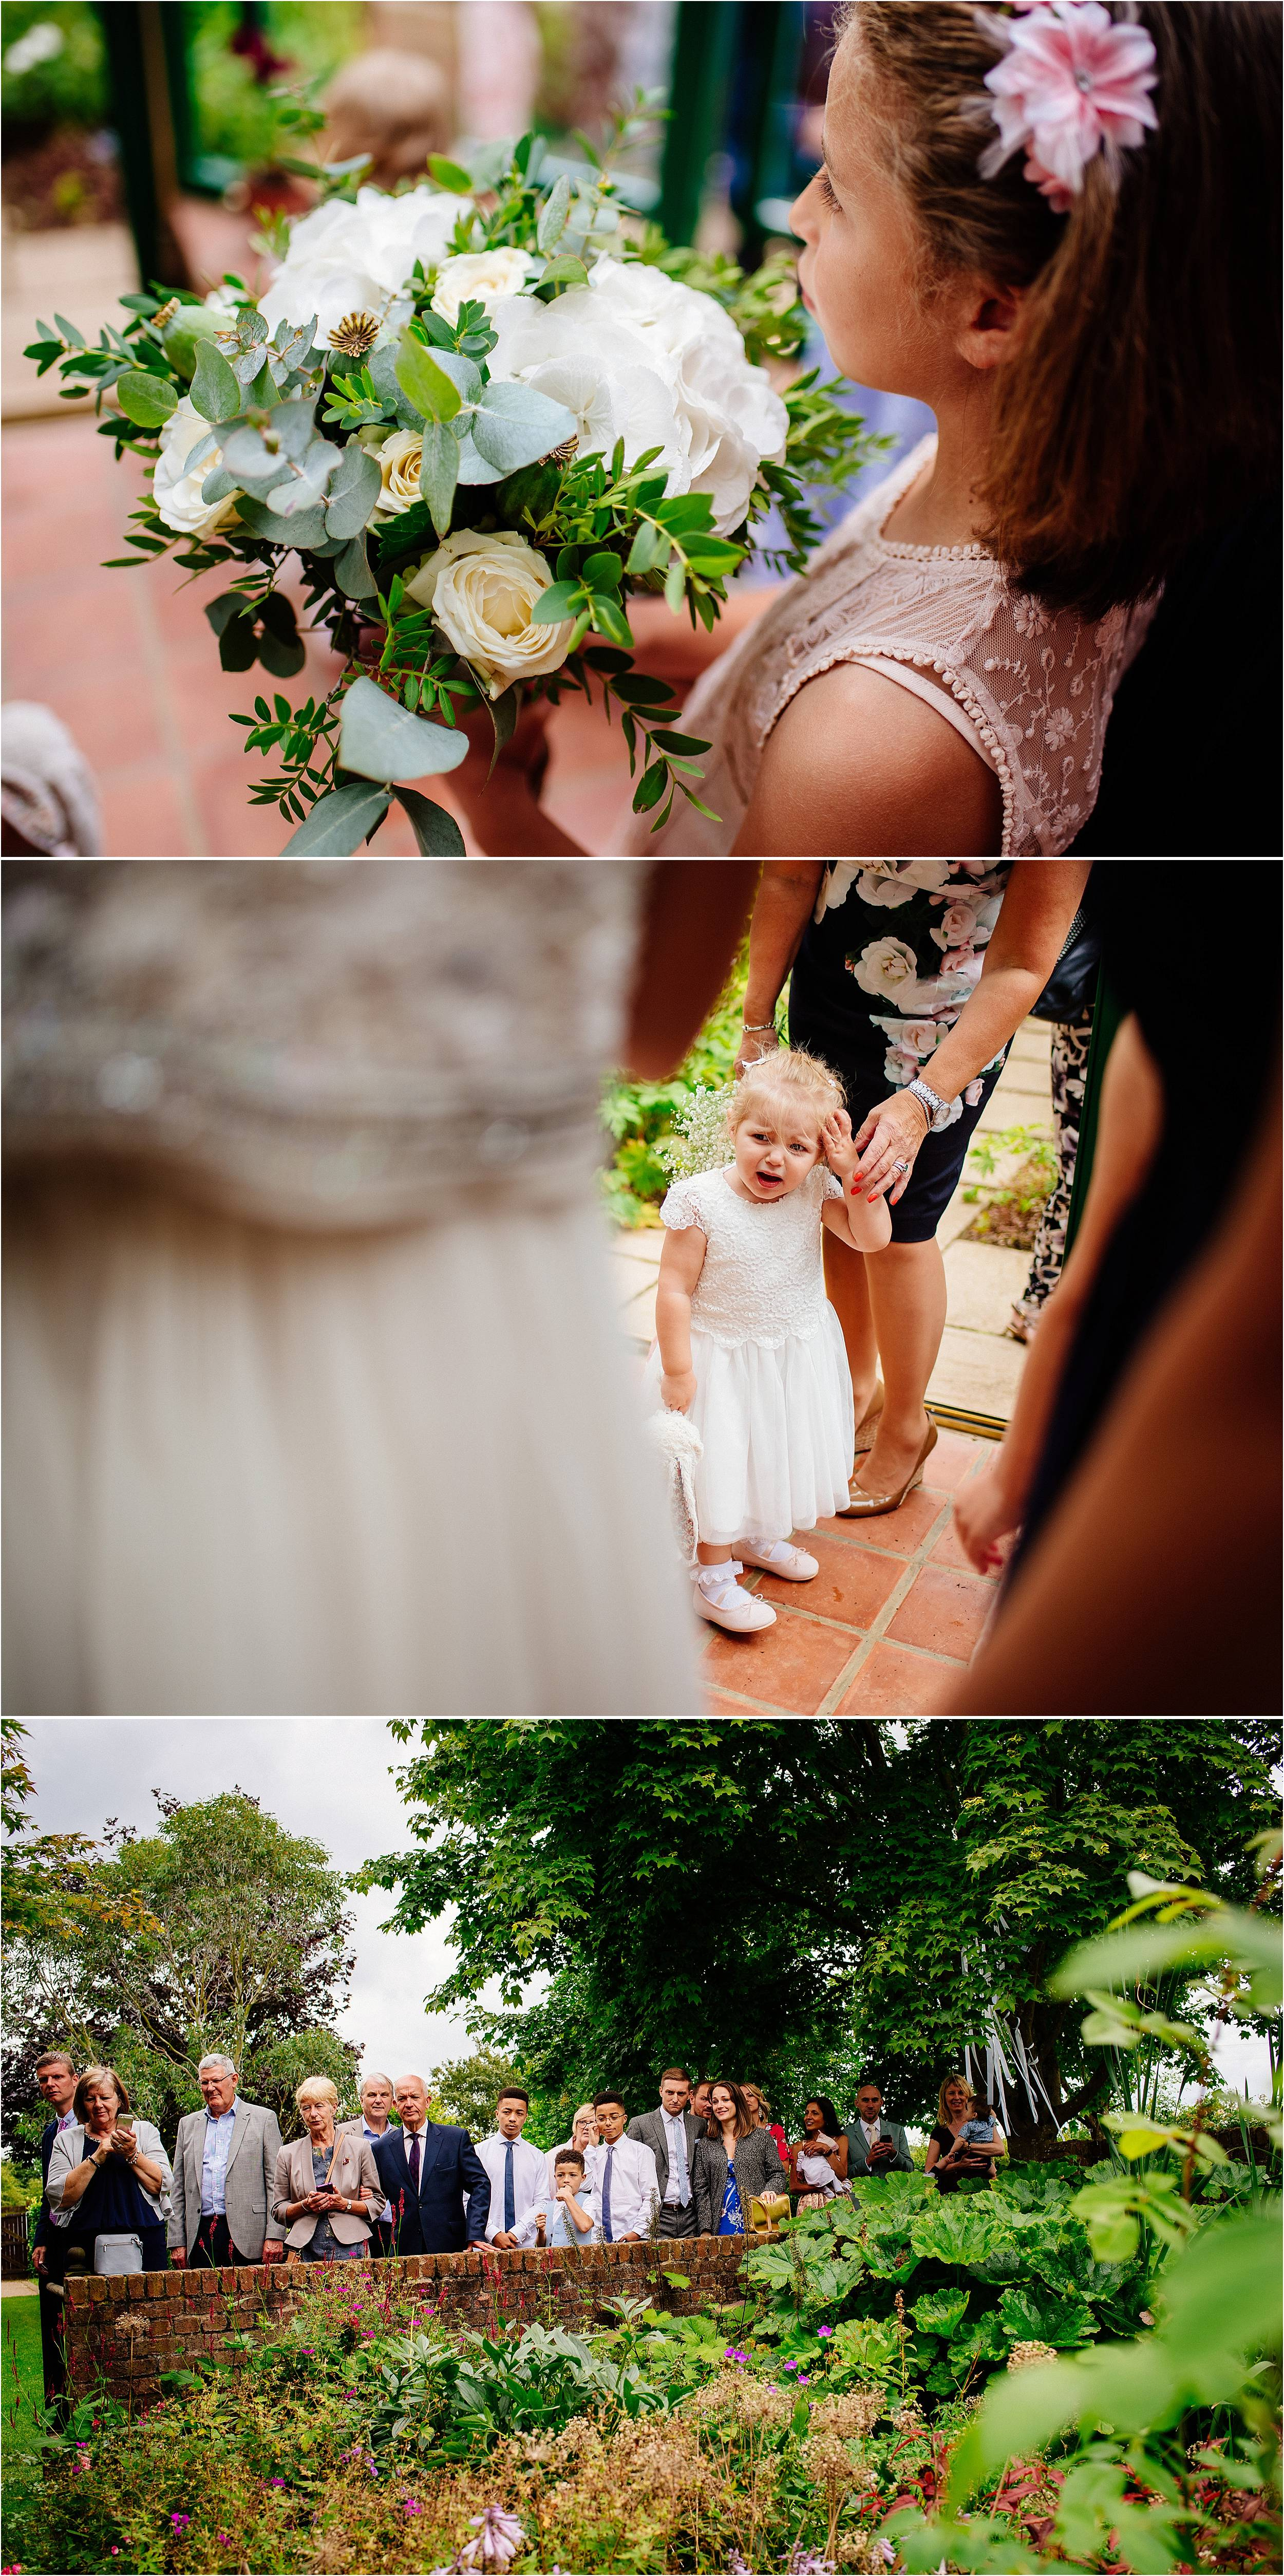 Barnsdale Gardens Wedding Photographer_0031.jpg